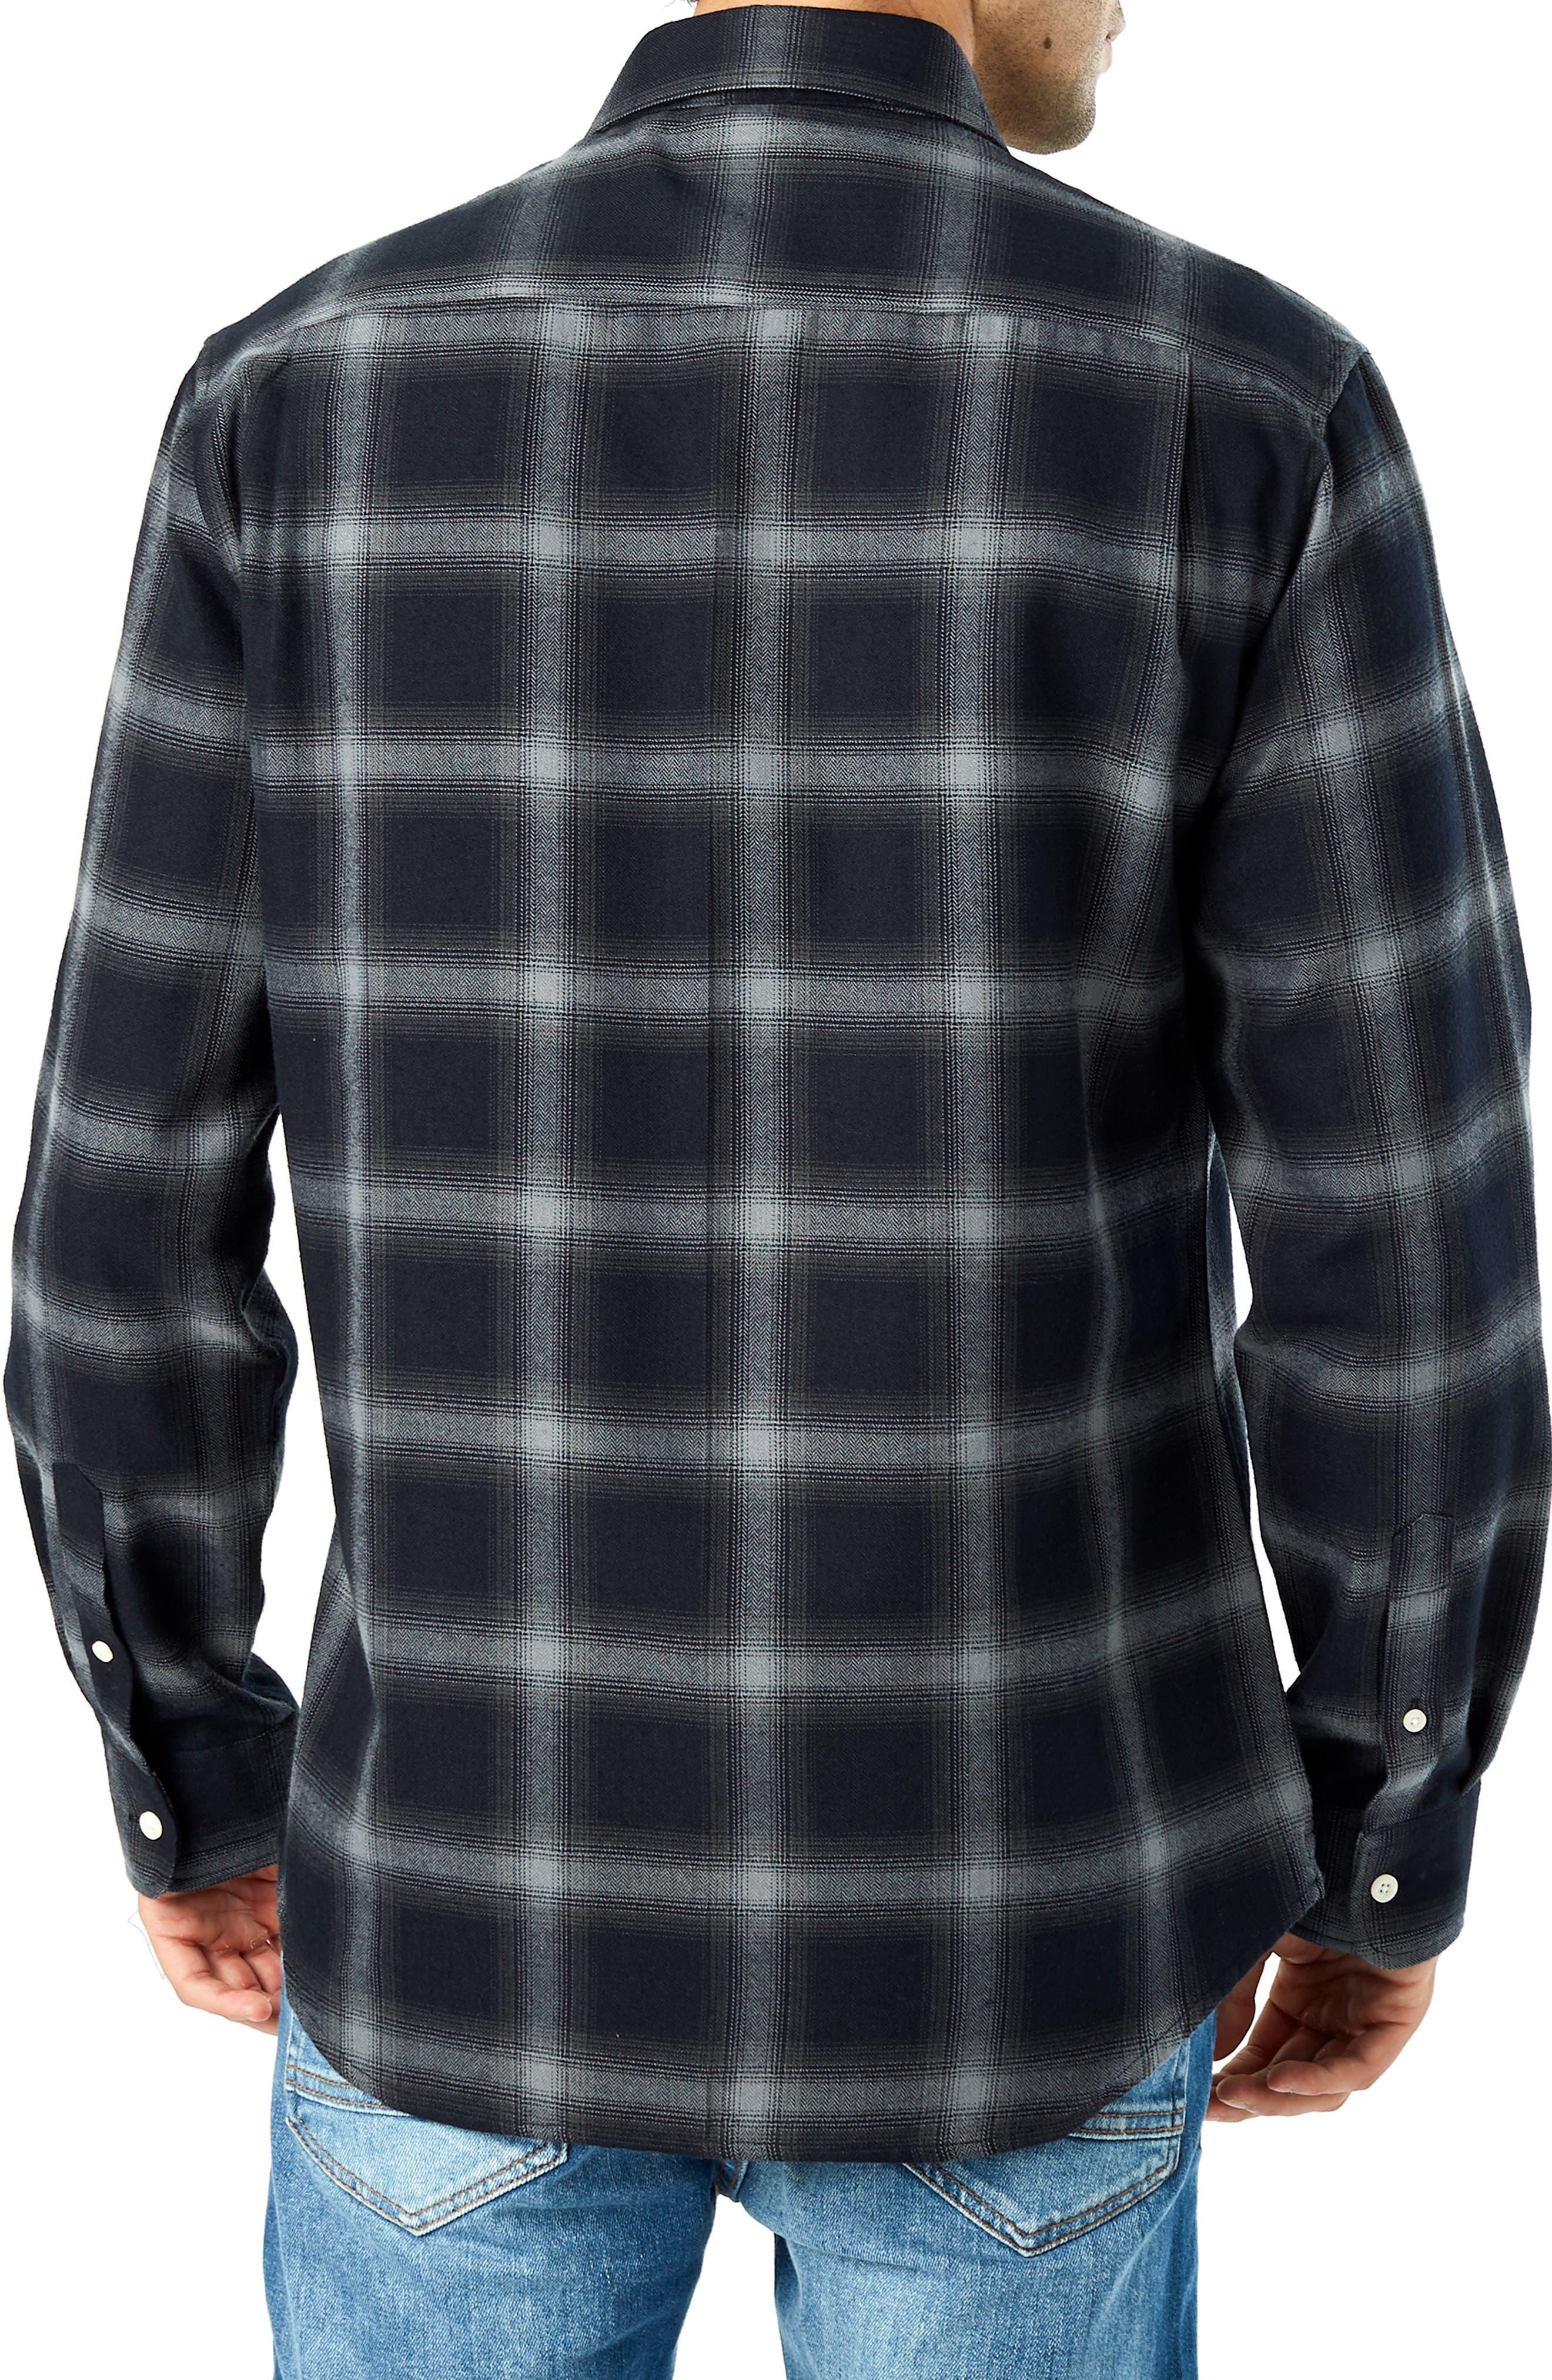 Hawk Slim Fit Sport Shirt,                             Alternate thumbnail 3, color,                             BLACK